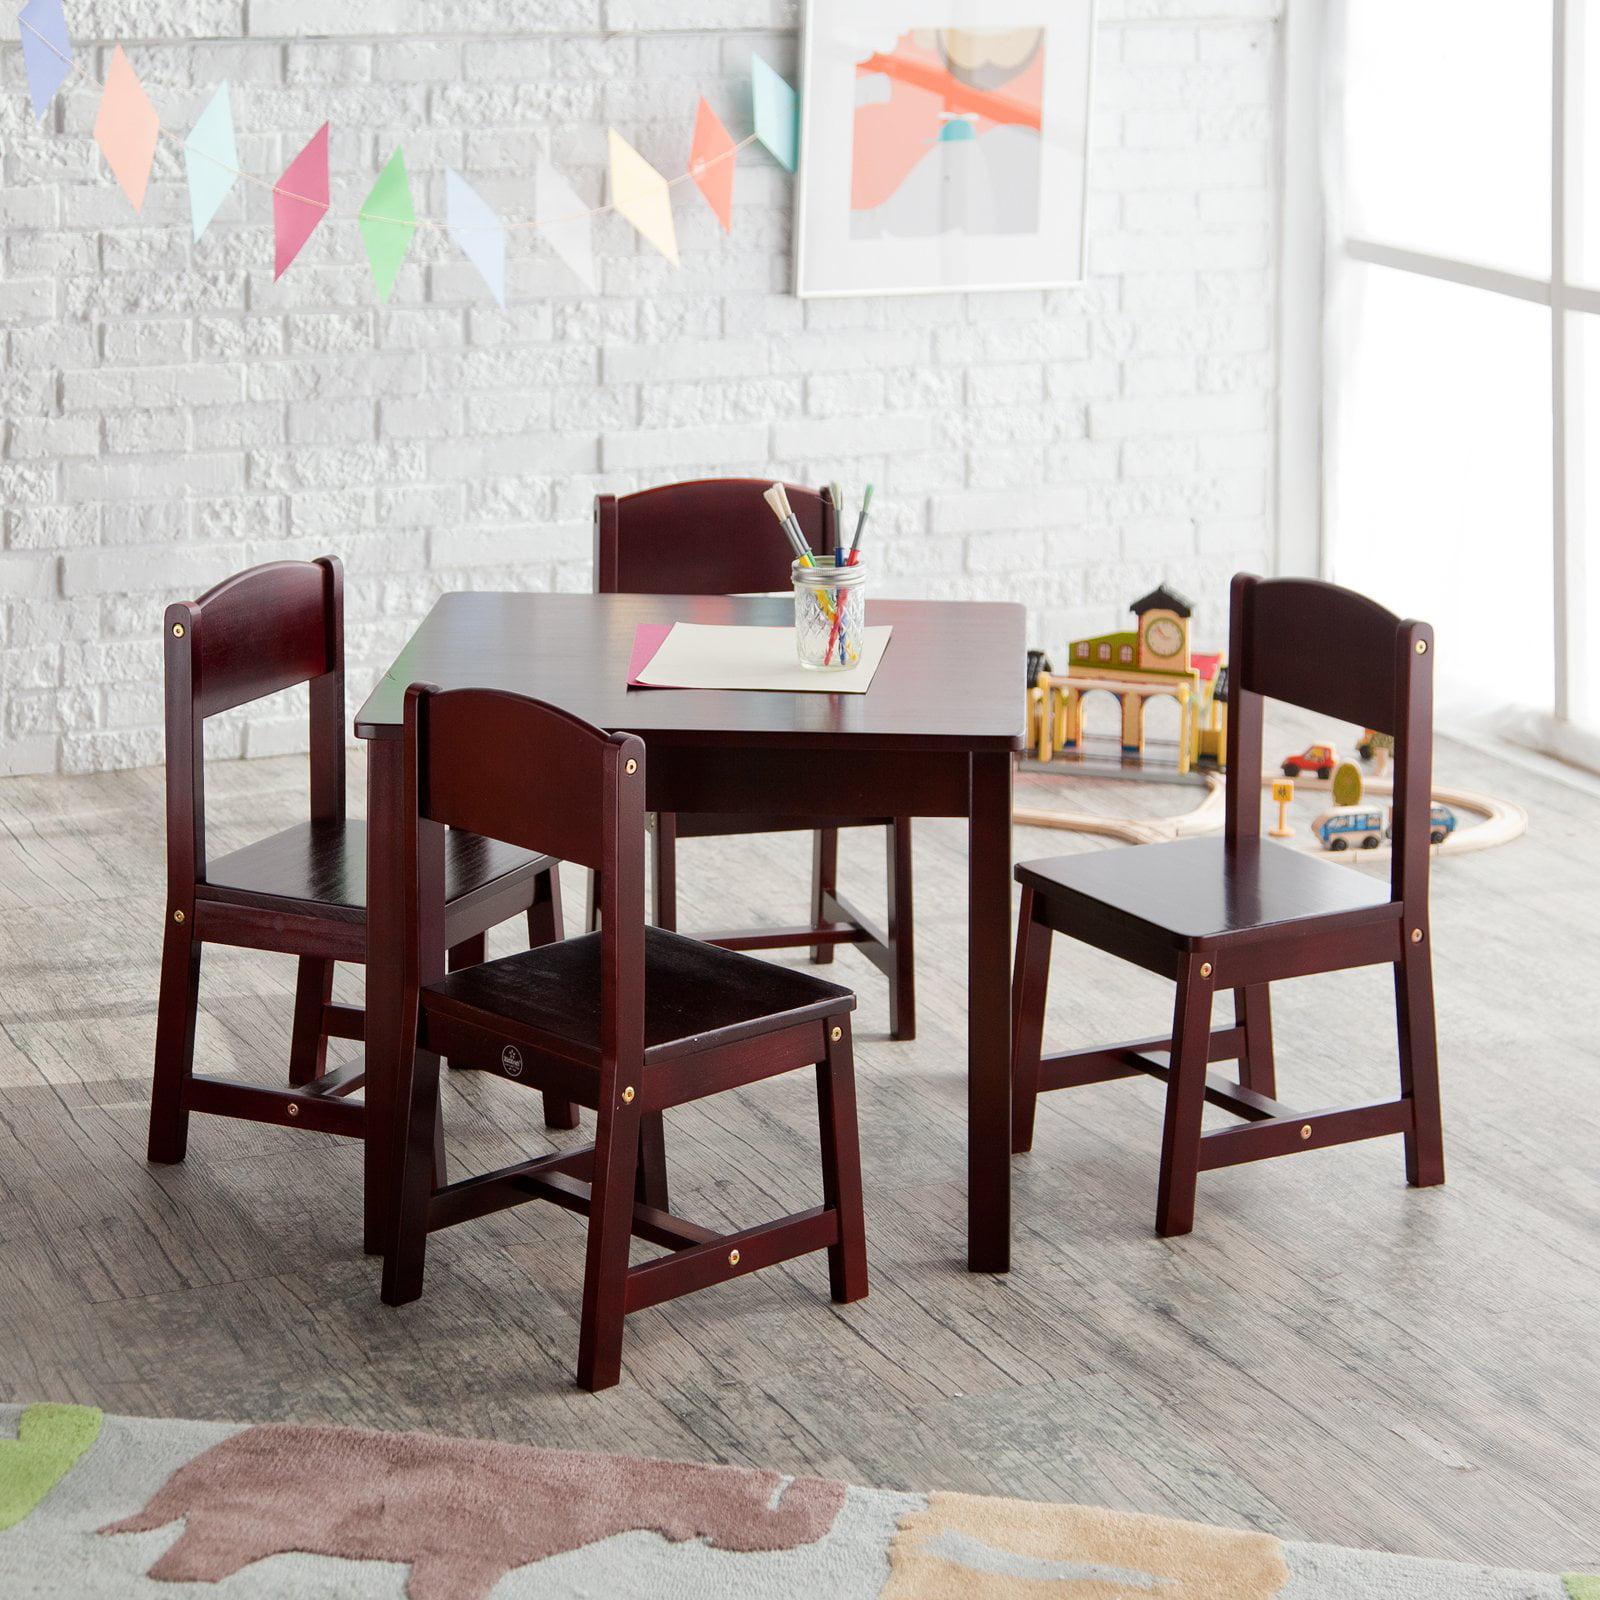 KidKraft Farmhouse Table U0026 4 Chair Set   Espresso   Walmart.com